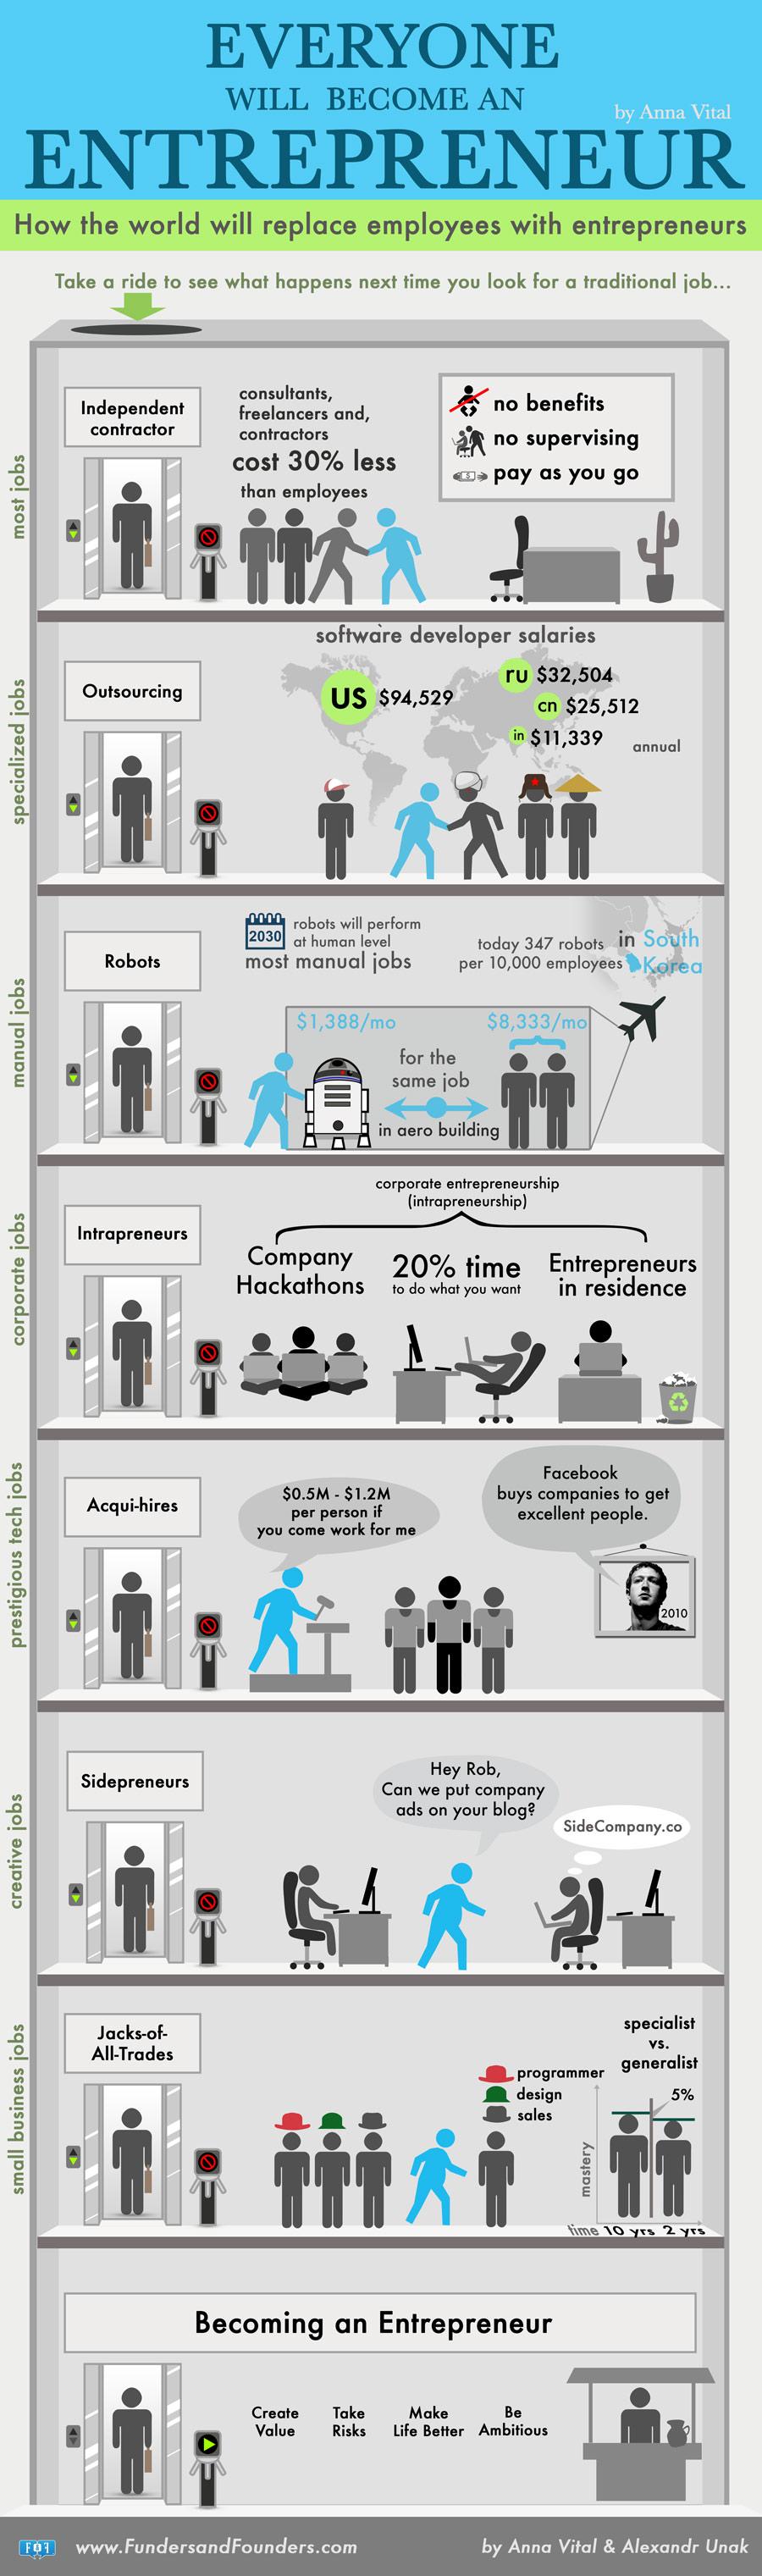 everyone-will-become-an-entrepreneur-1